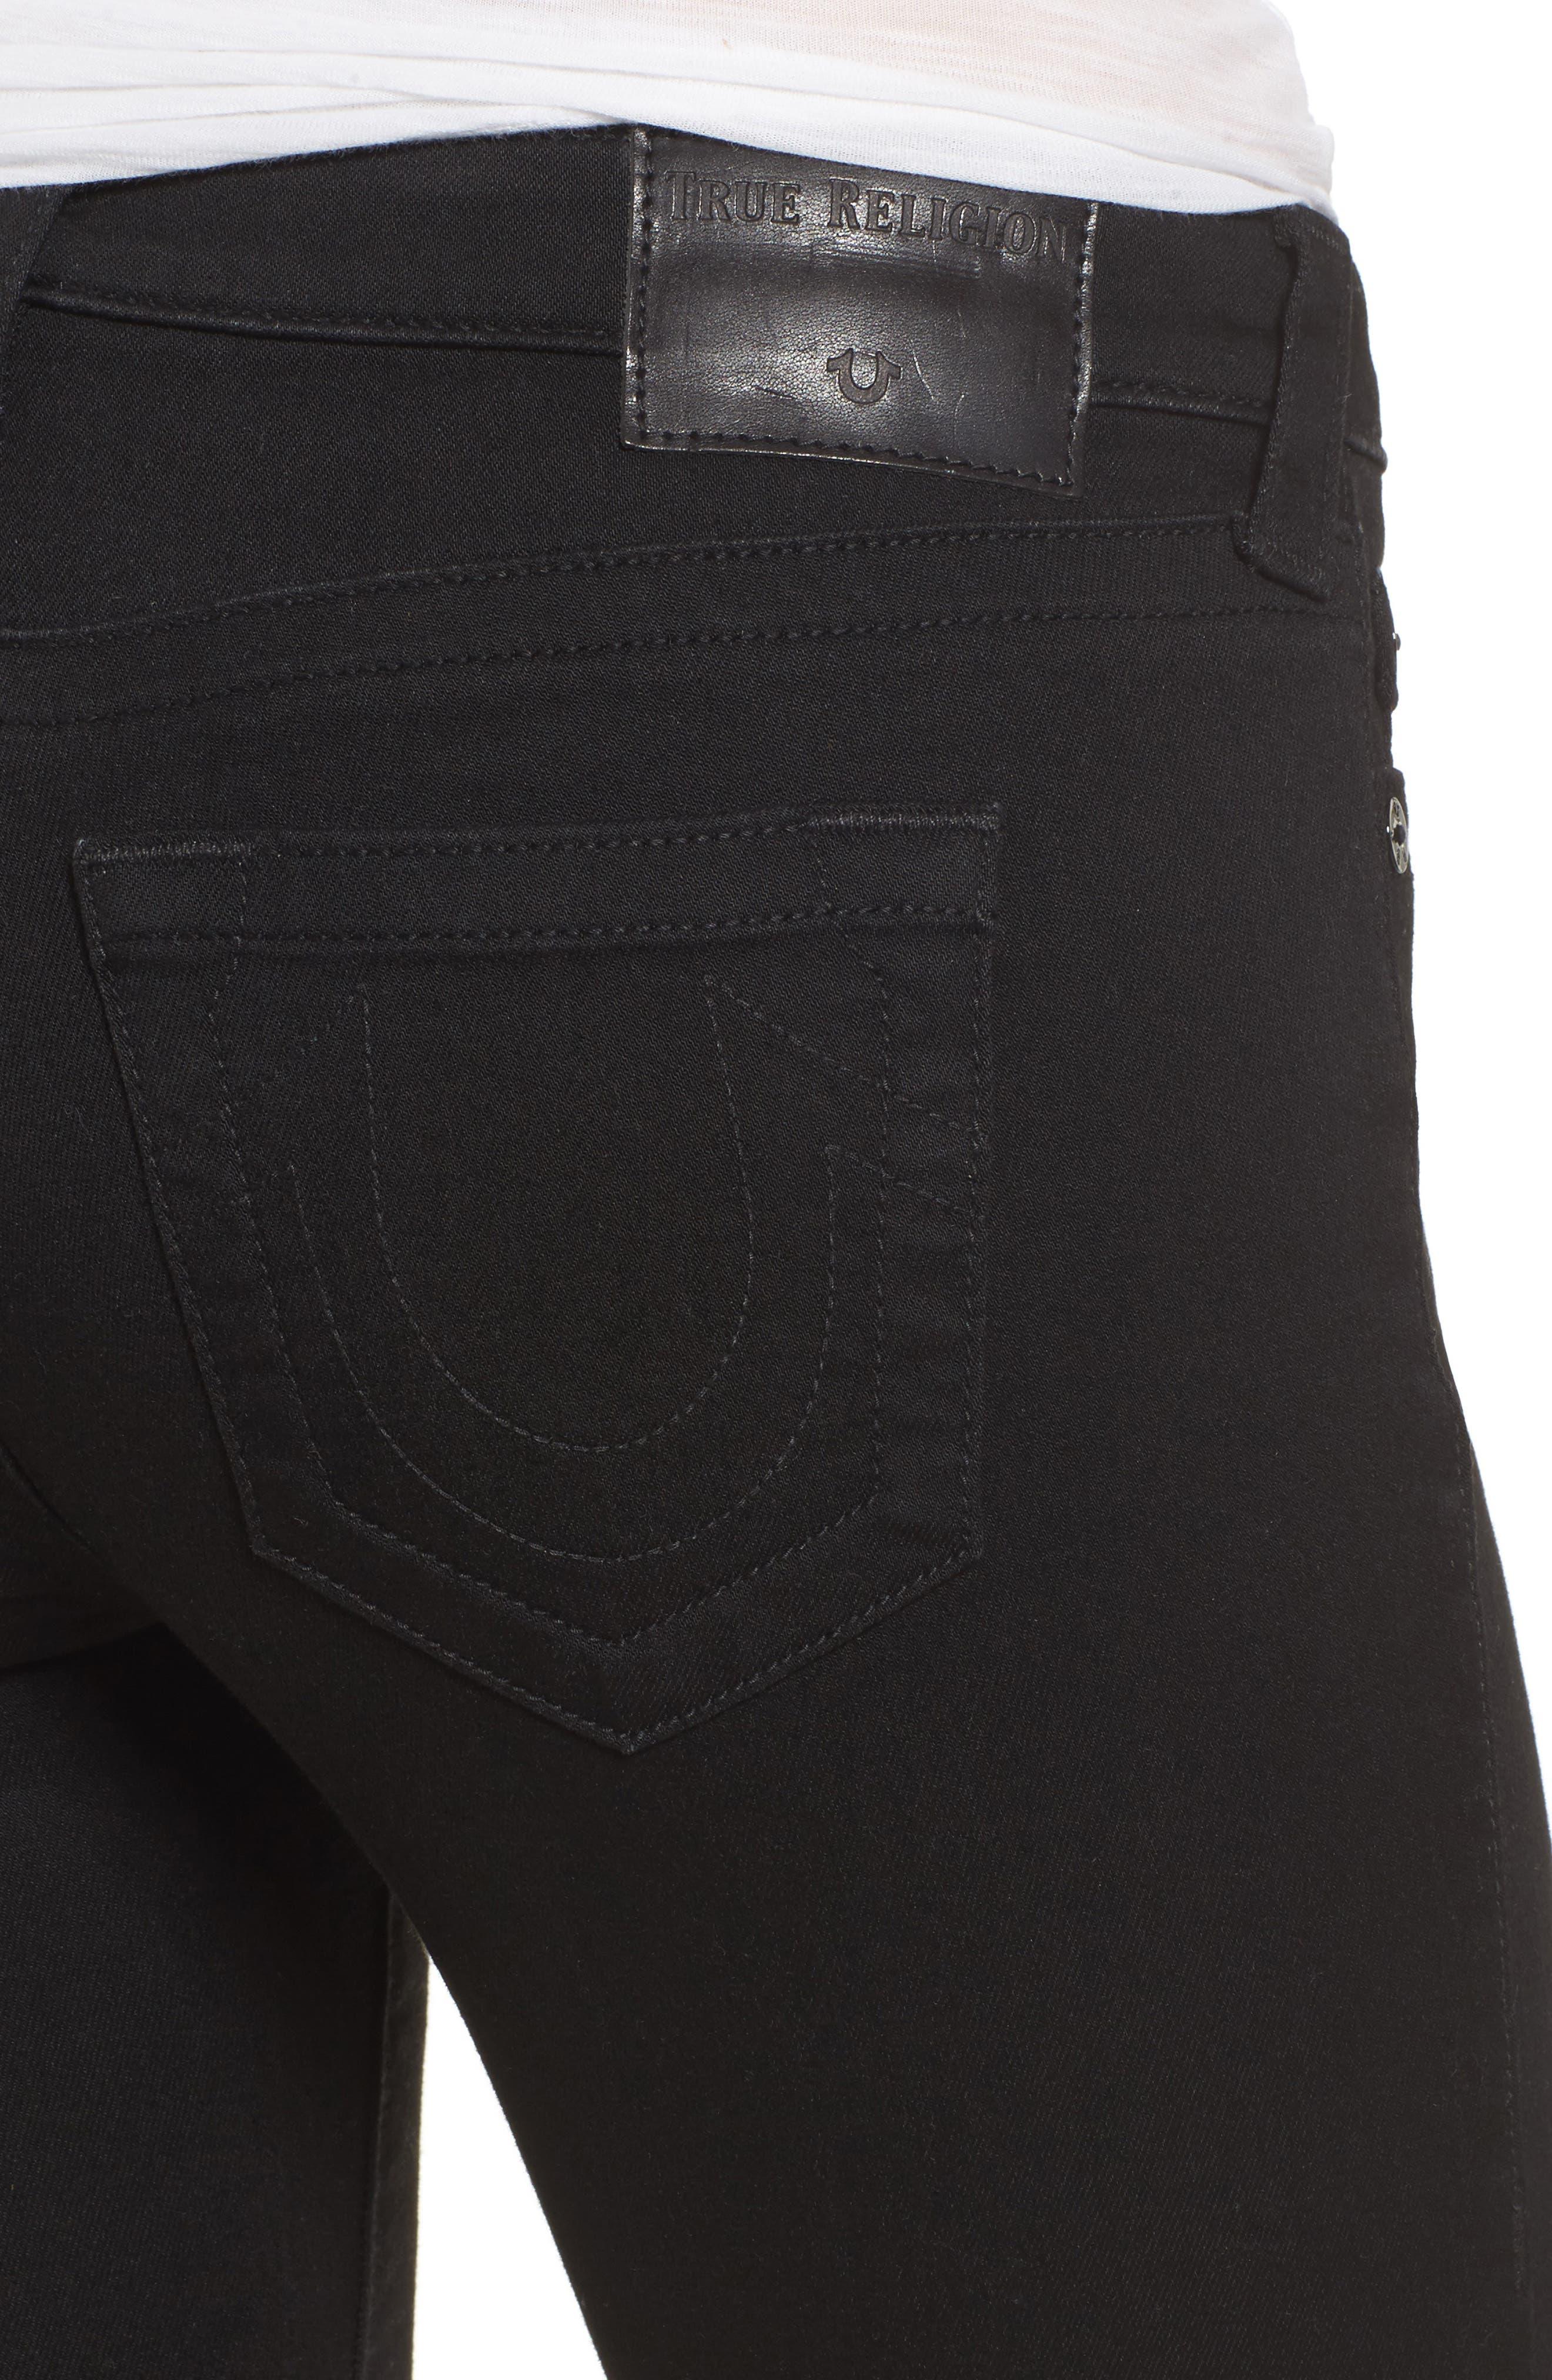 Halle Super Skinny Jeans,                             Alternate thumbnail 4, color,